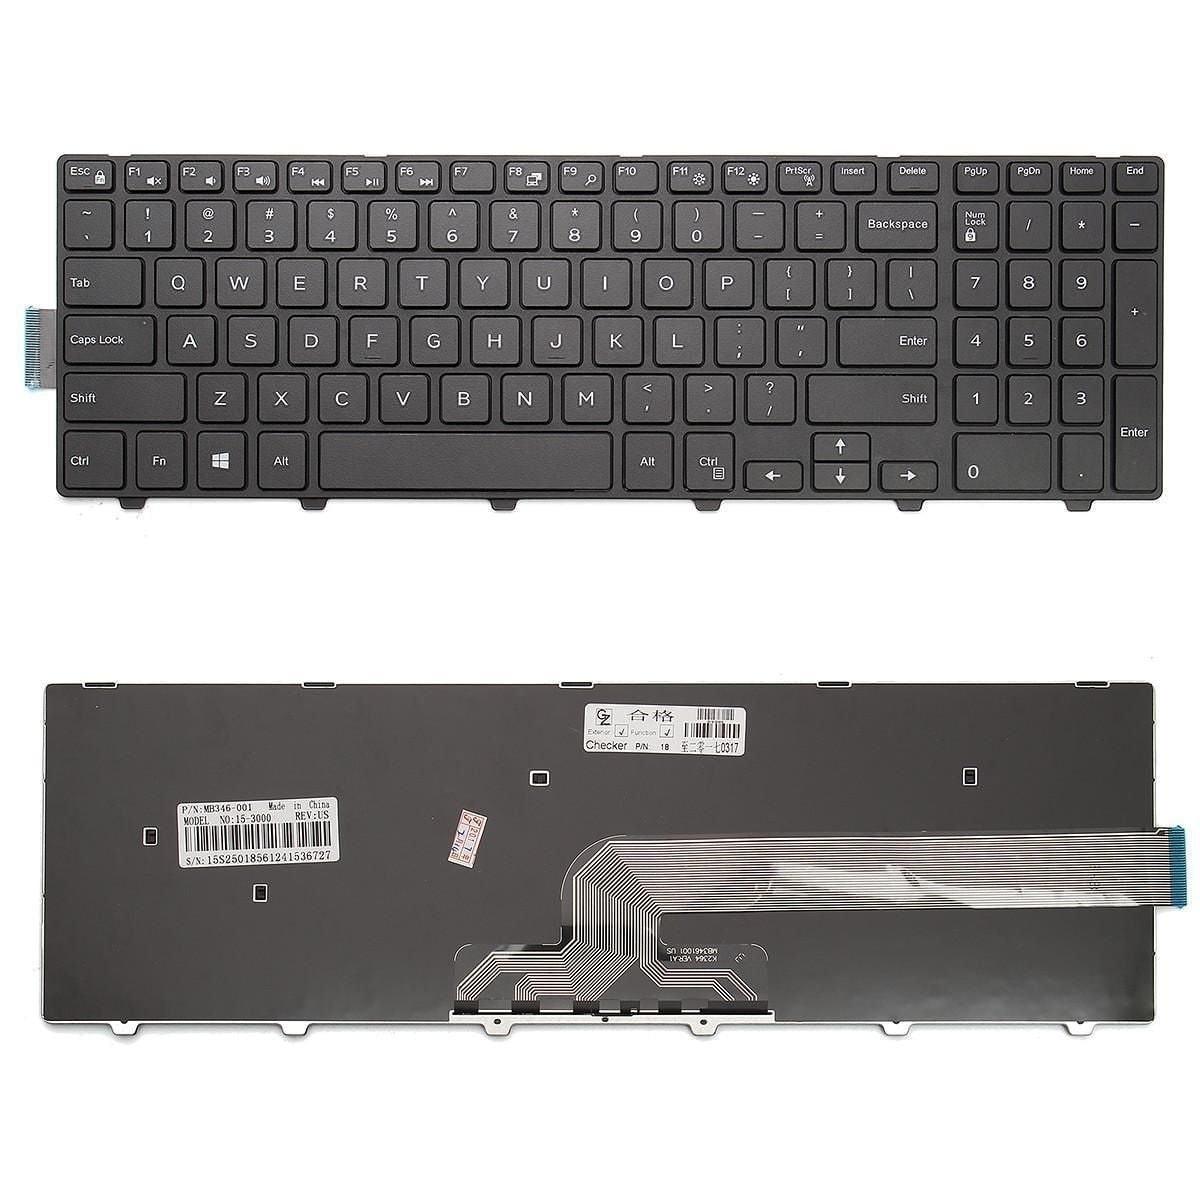 Dell INSPIRON 3552 Laptop Replacemet Keyboard